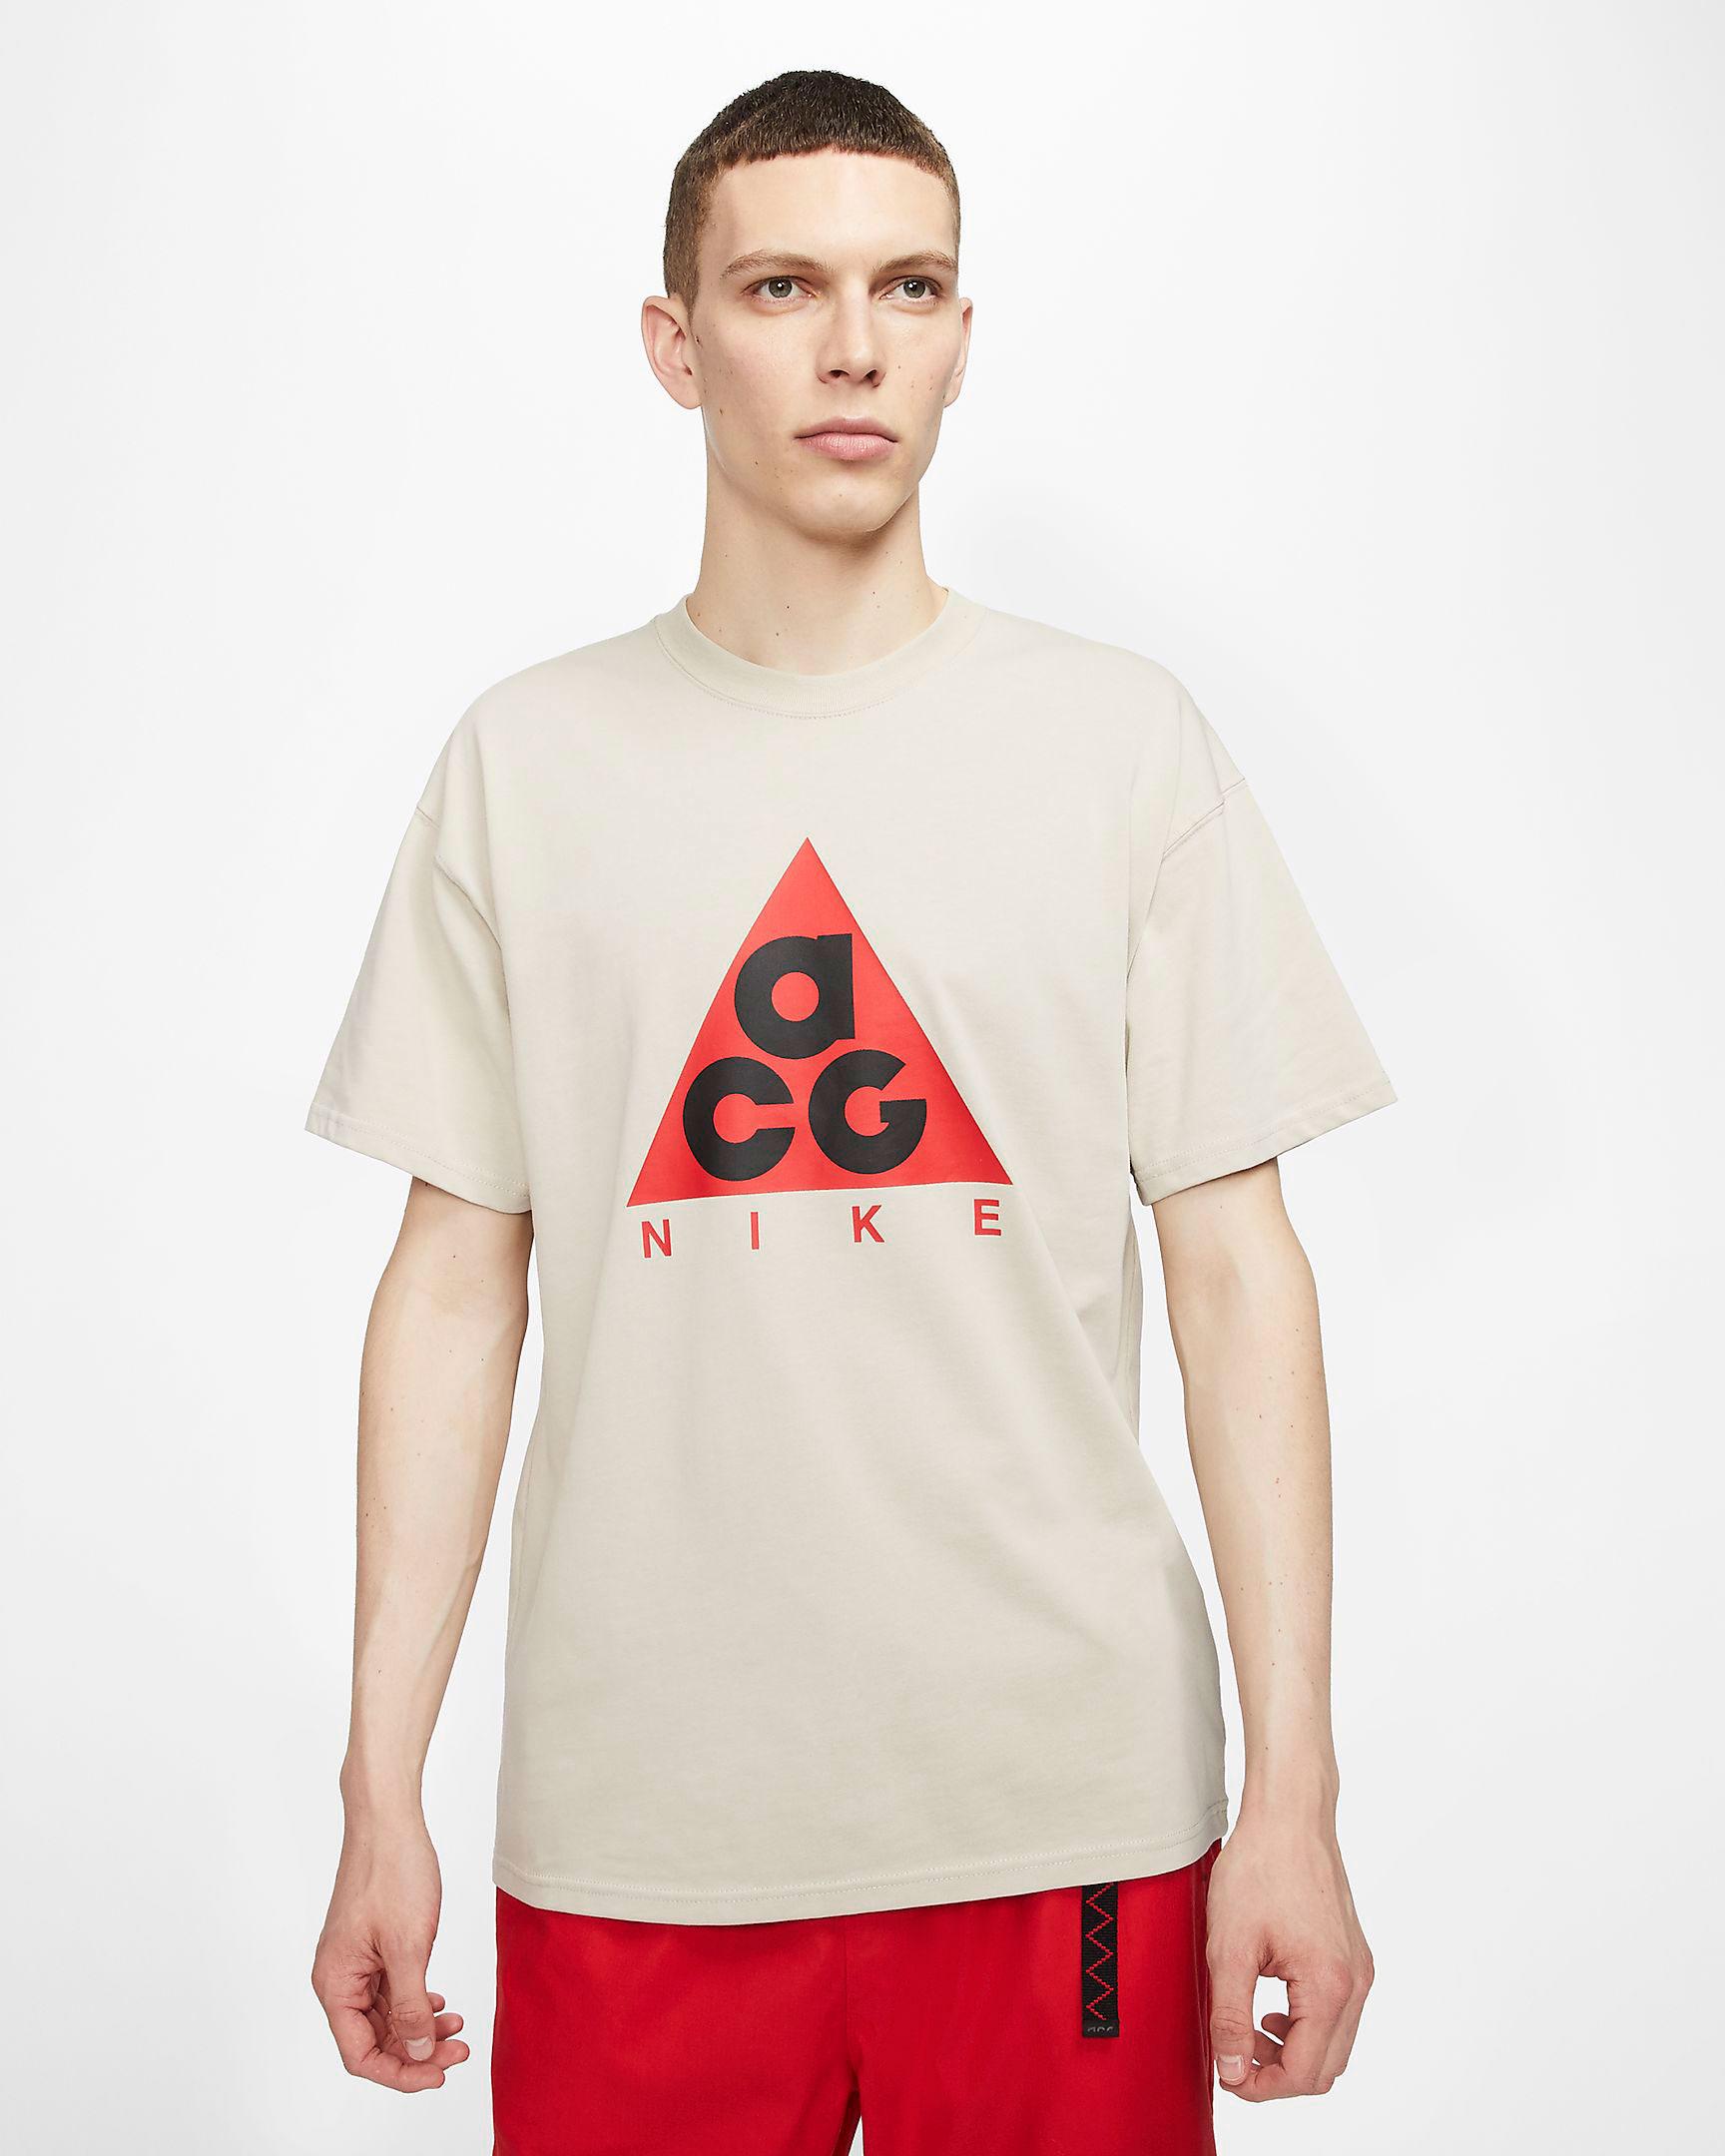 nike-acg-logo-t-shirt-khaki-red